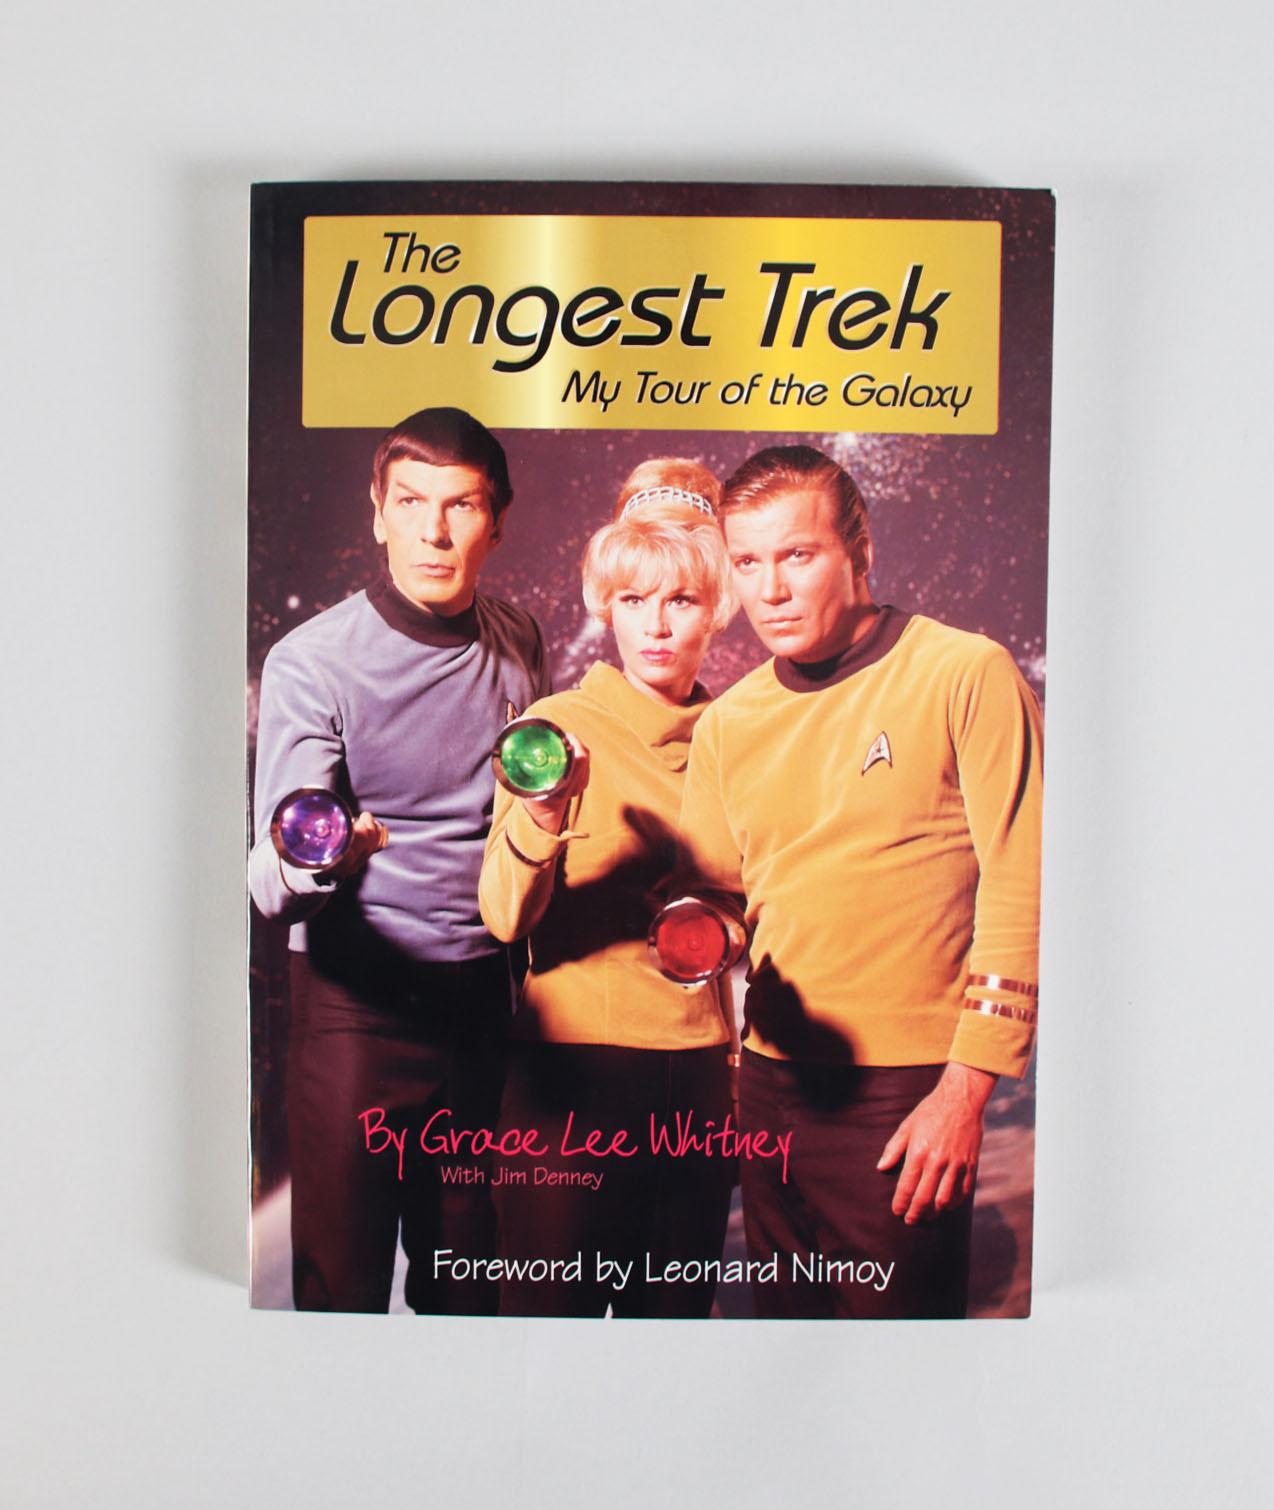 My Tour of the Galaxy The Longest Trek